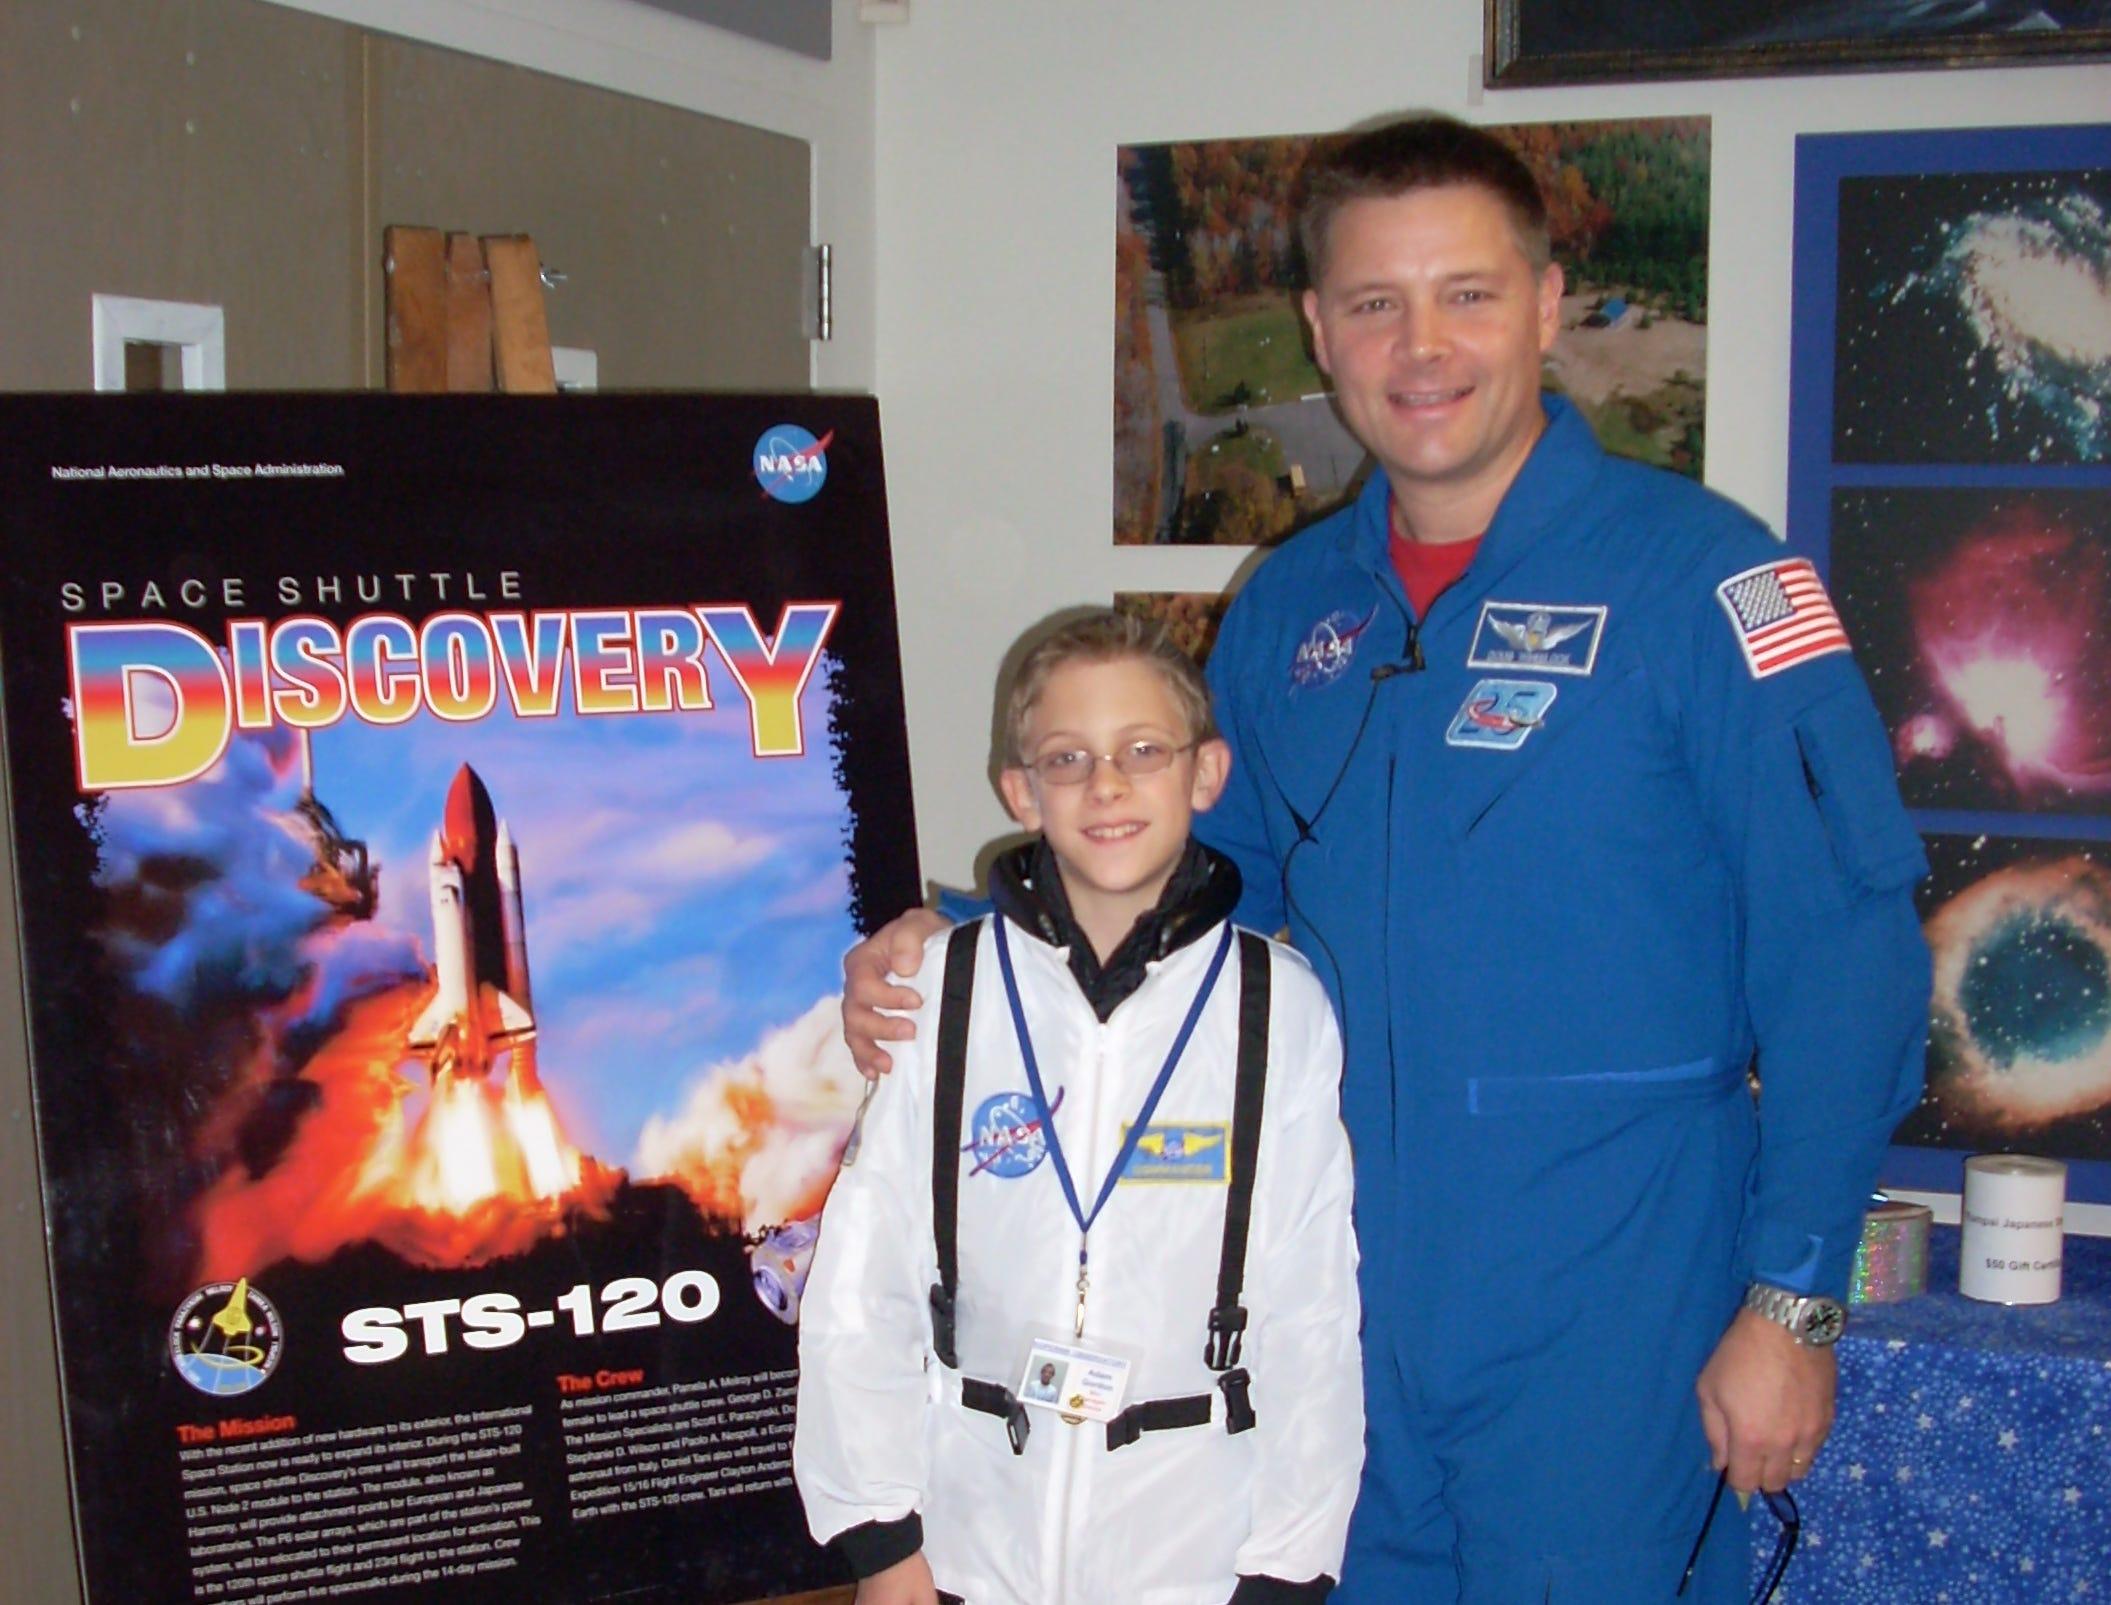 Douglas H. Wheelock, NASA astronaut, was born in Binghamton and graduated from Windsor High School.